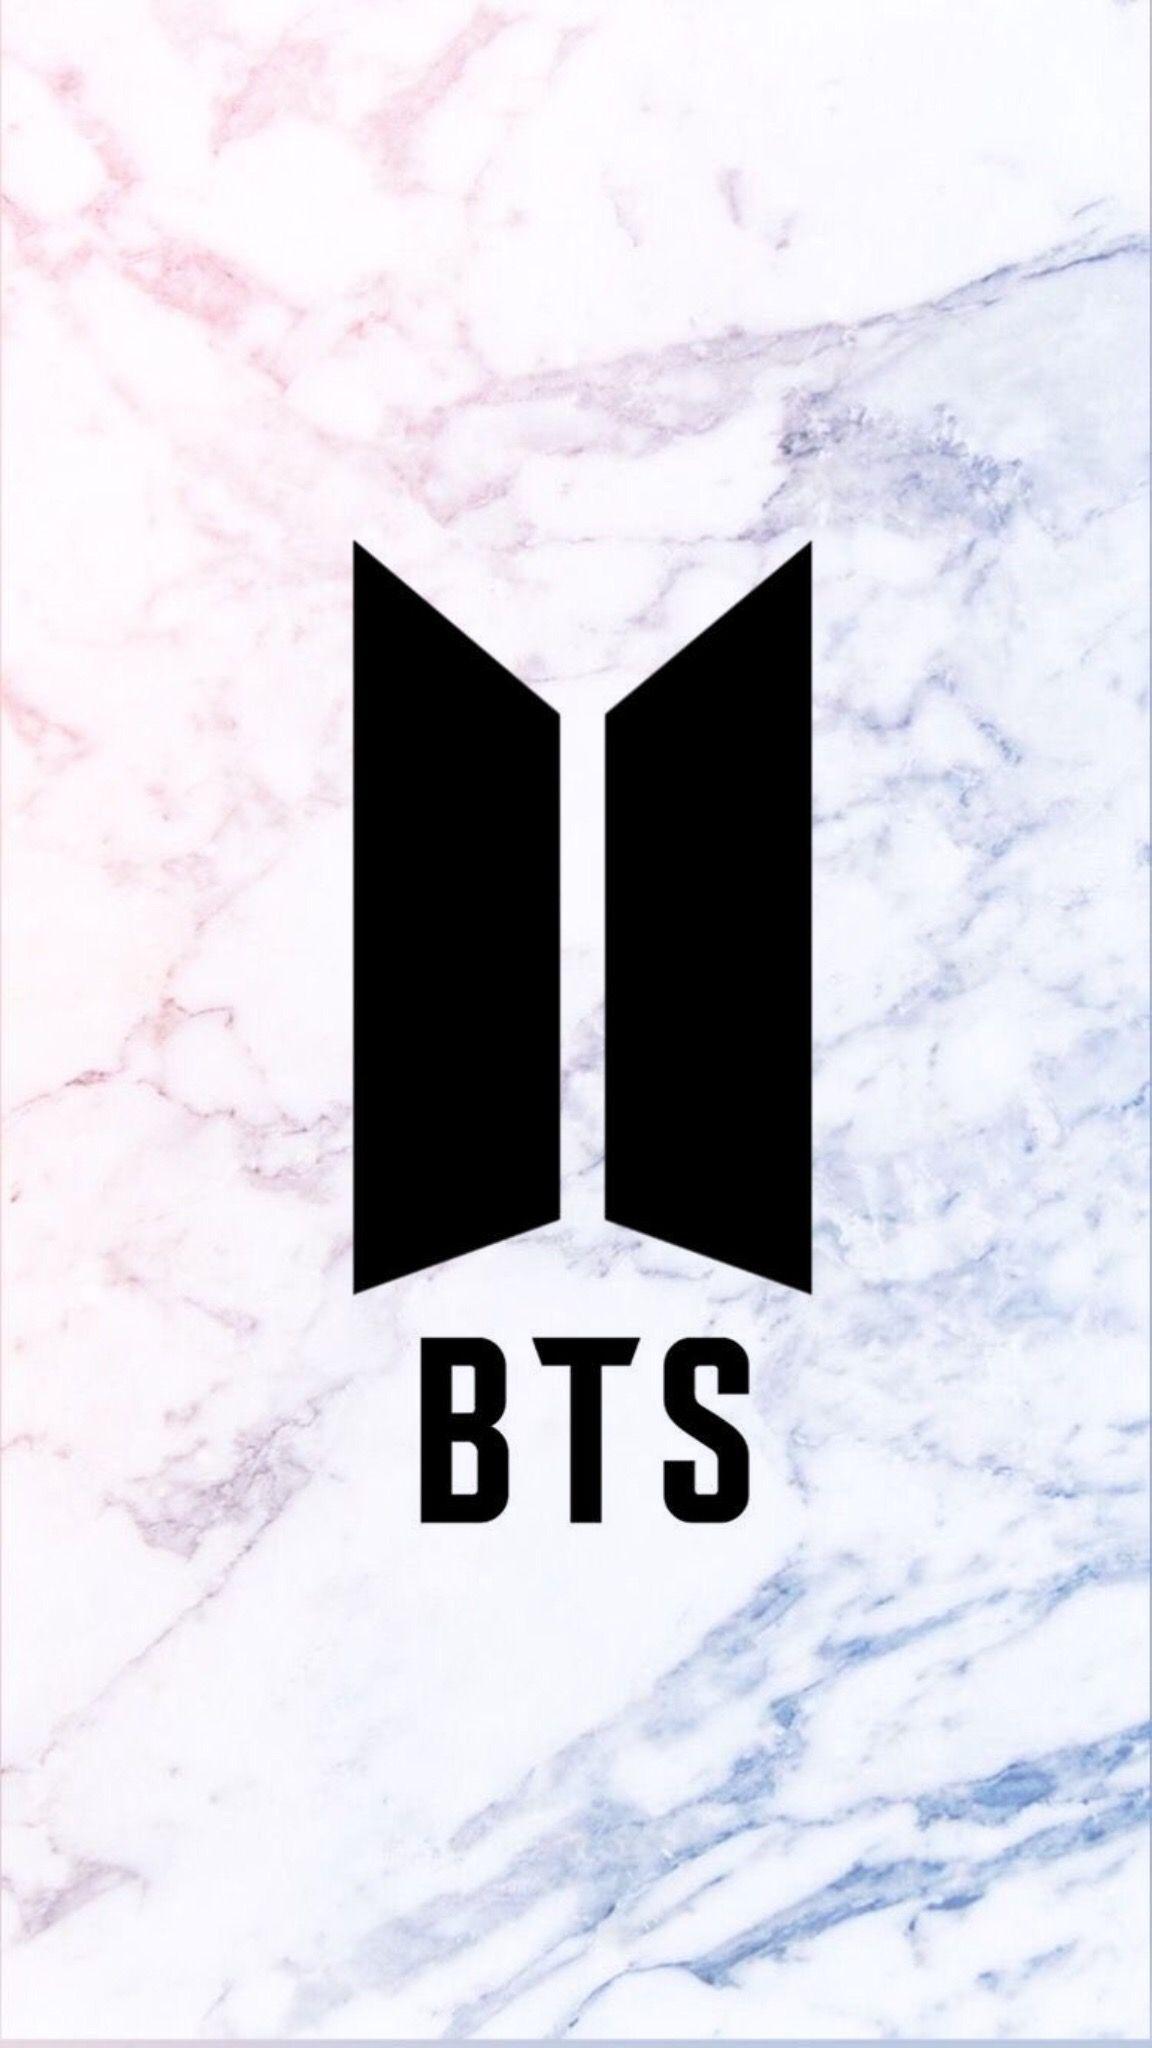 Bts Logo Wallpapers Top Free Bts Logo Backgrounds Wallpaperaccess Bts Wallpaper Bts Bts Army Logo